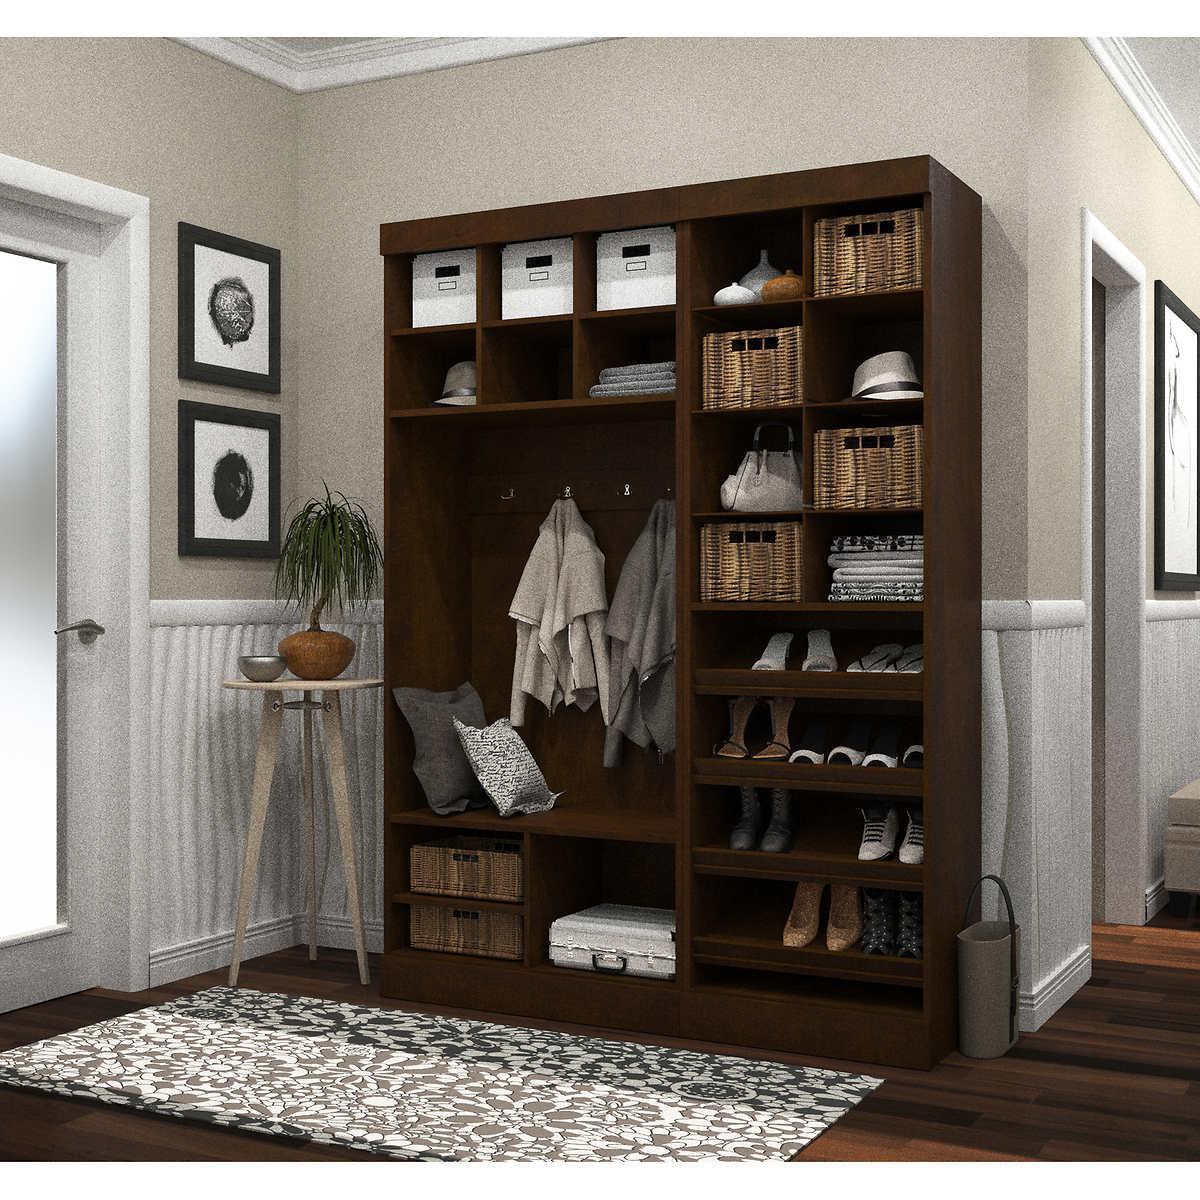 Organization Furniture Storage & Organization  Costco